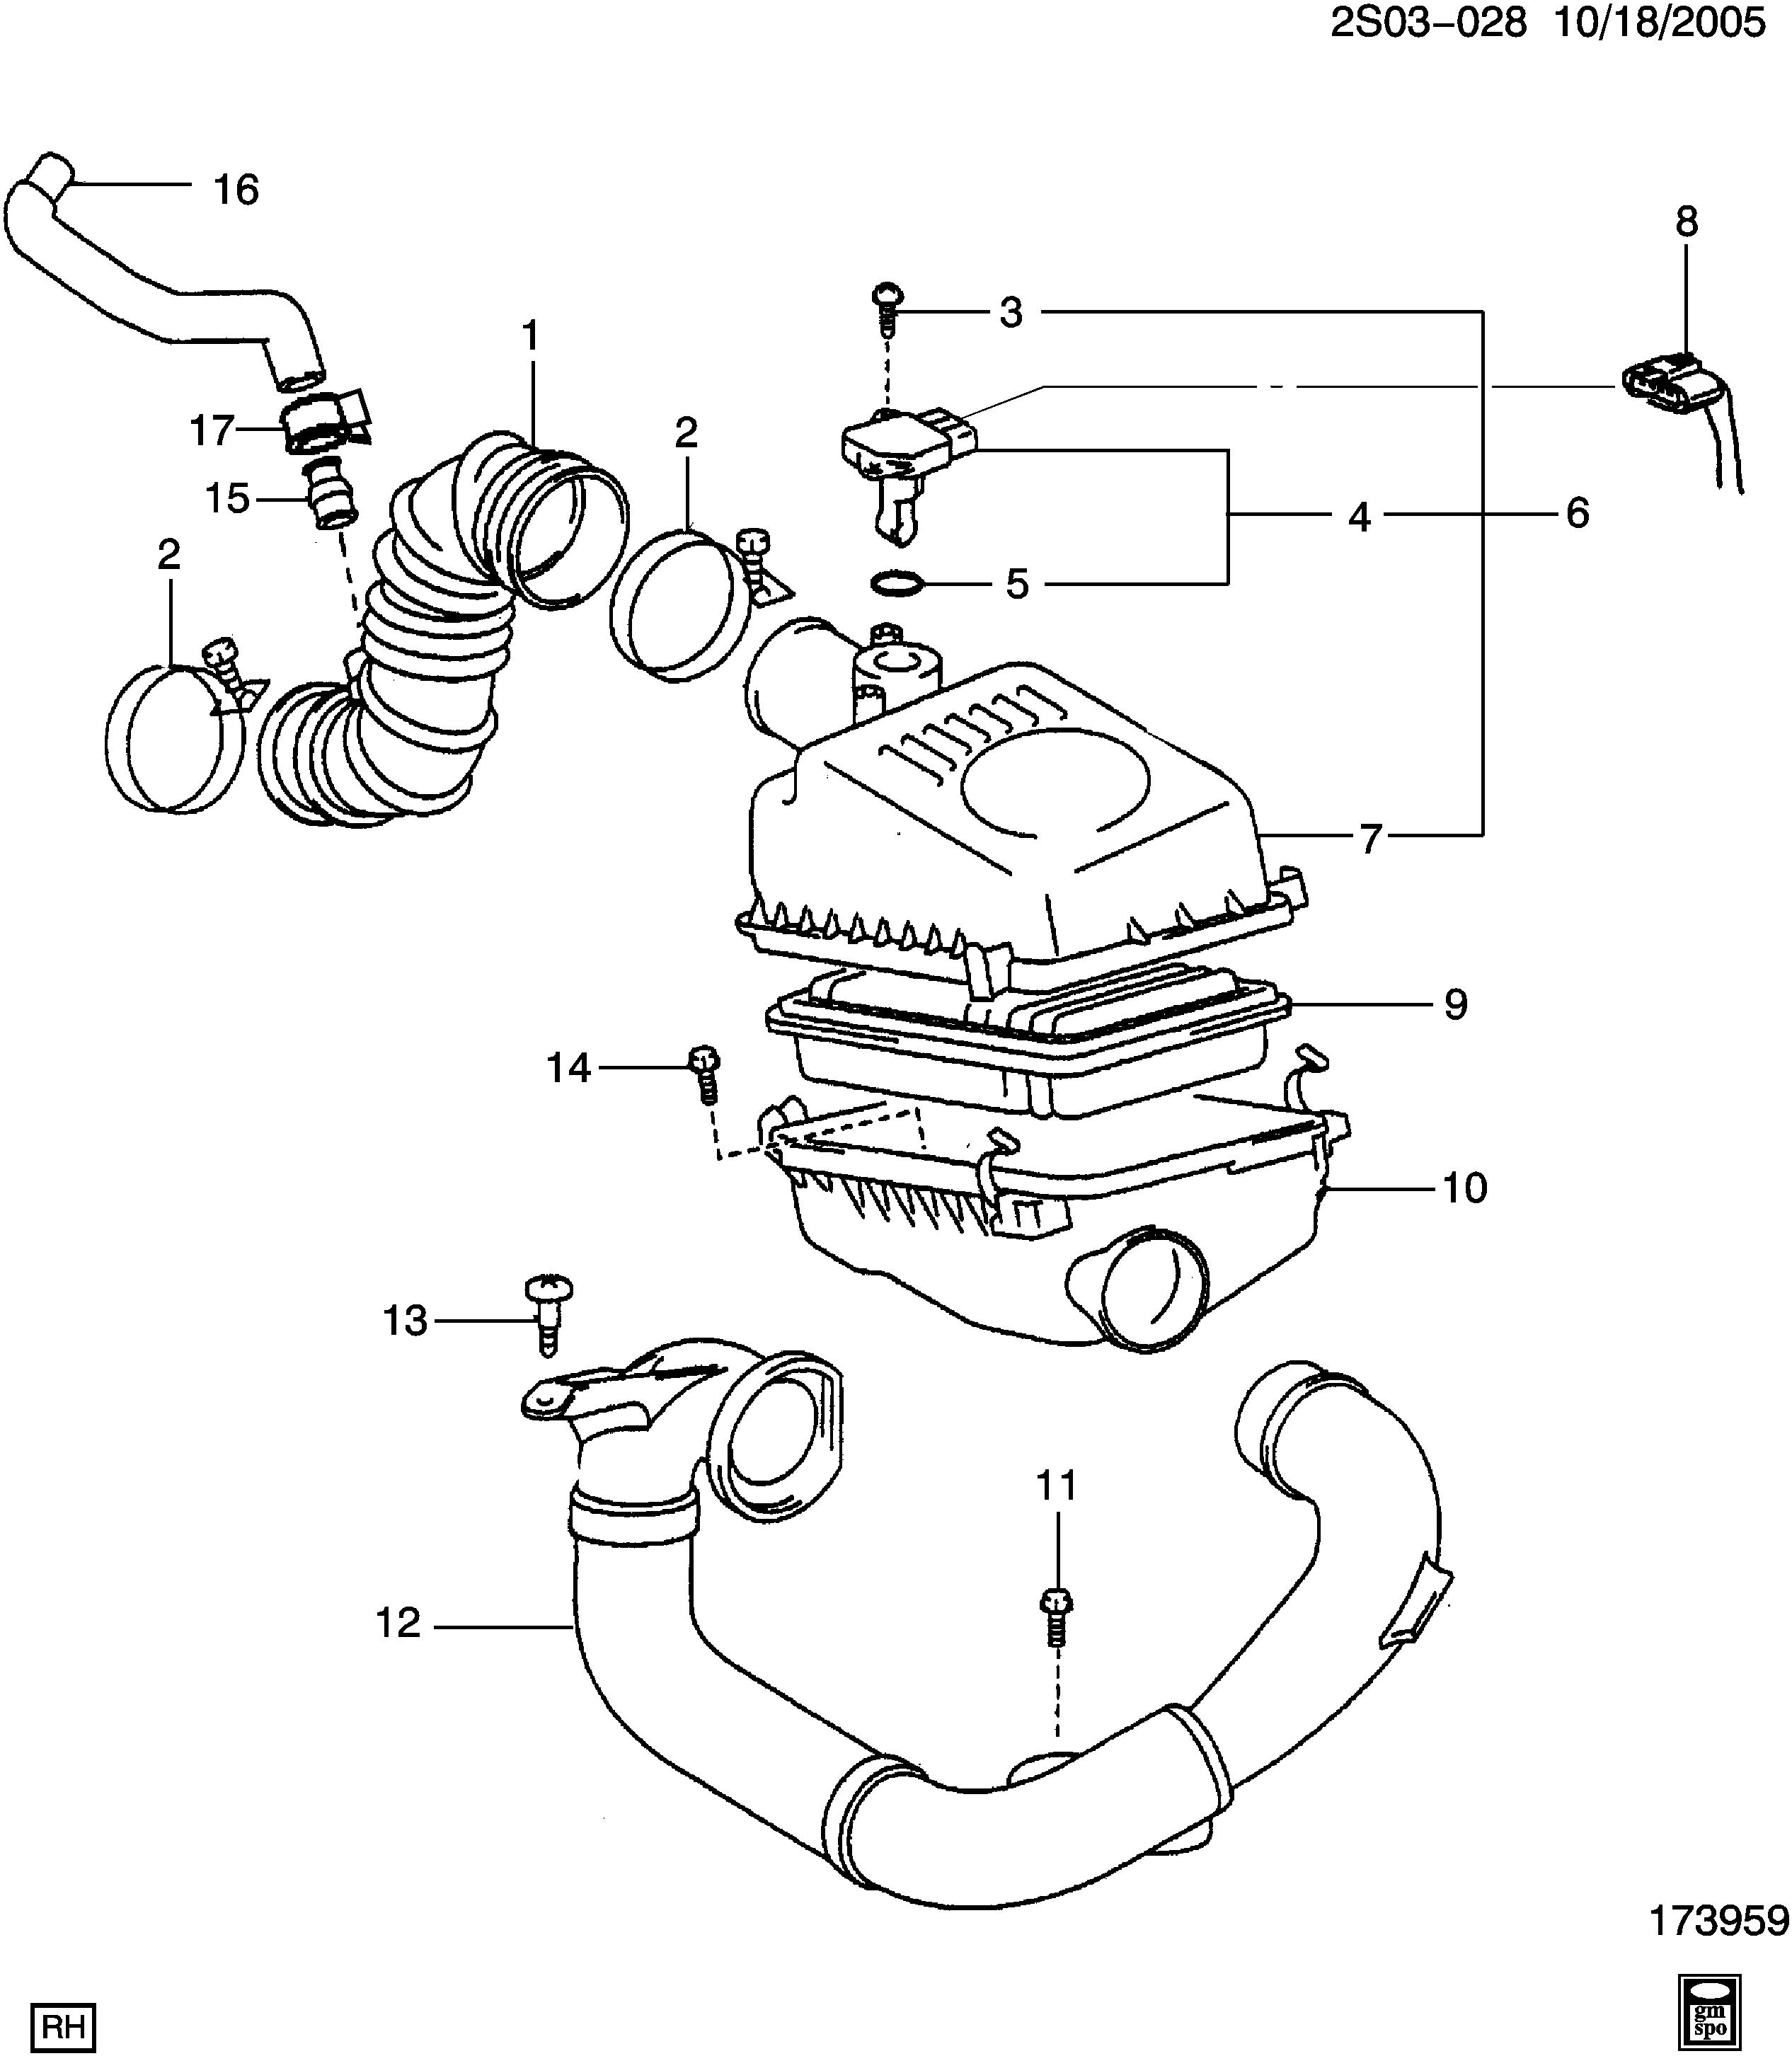 Pontiac Vibe Engine Diagram Intake Wiring Diagram Corsa B Corsa B Pasticceriagele It